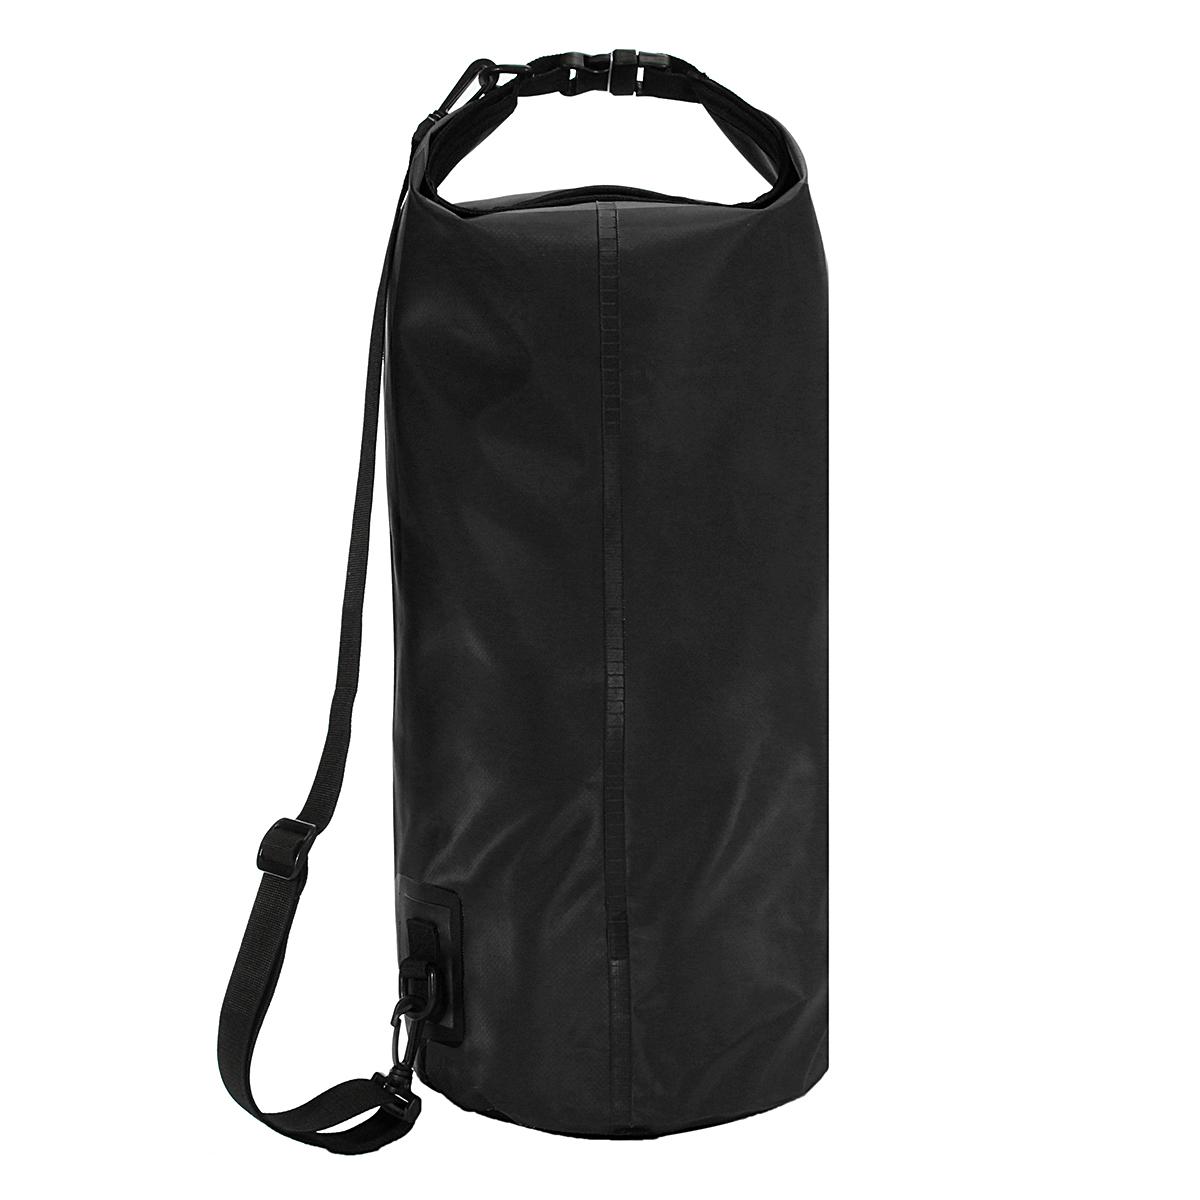 e89b559d966 20L Waterproof Bag Storage Dry Pack Camping Hiking Swimming Rafting Kayak  Float Pouch. 9fb257e5-3d06-4f64-92d4-6c22bb2b9a25.